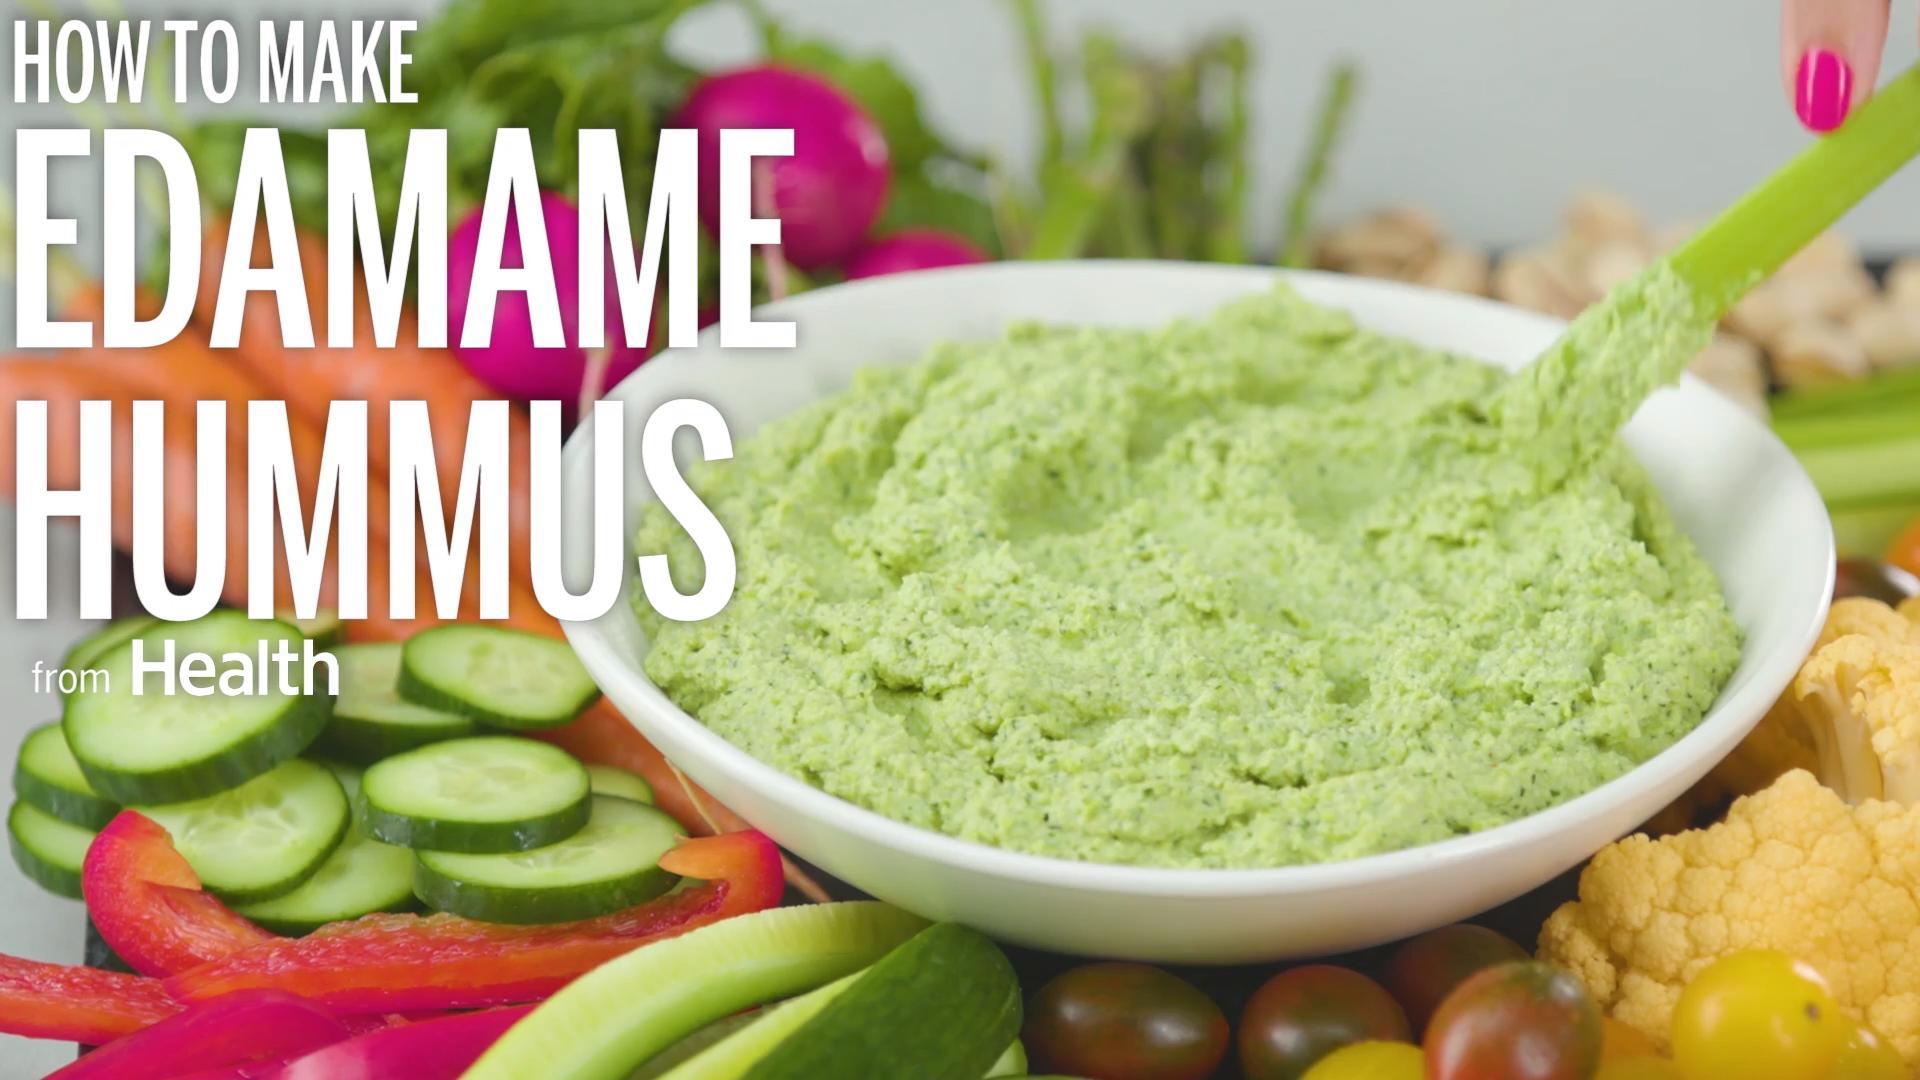 Easy hummus recipes